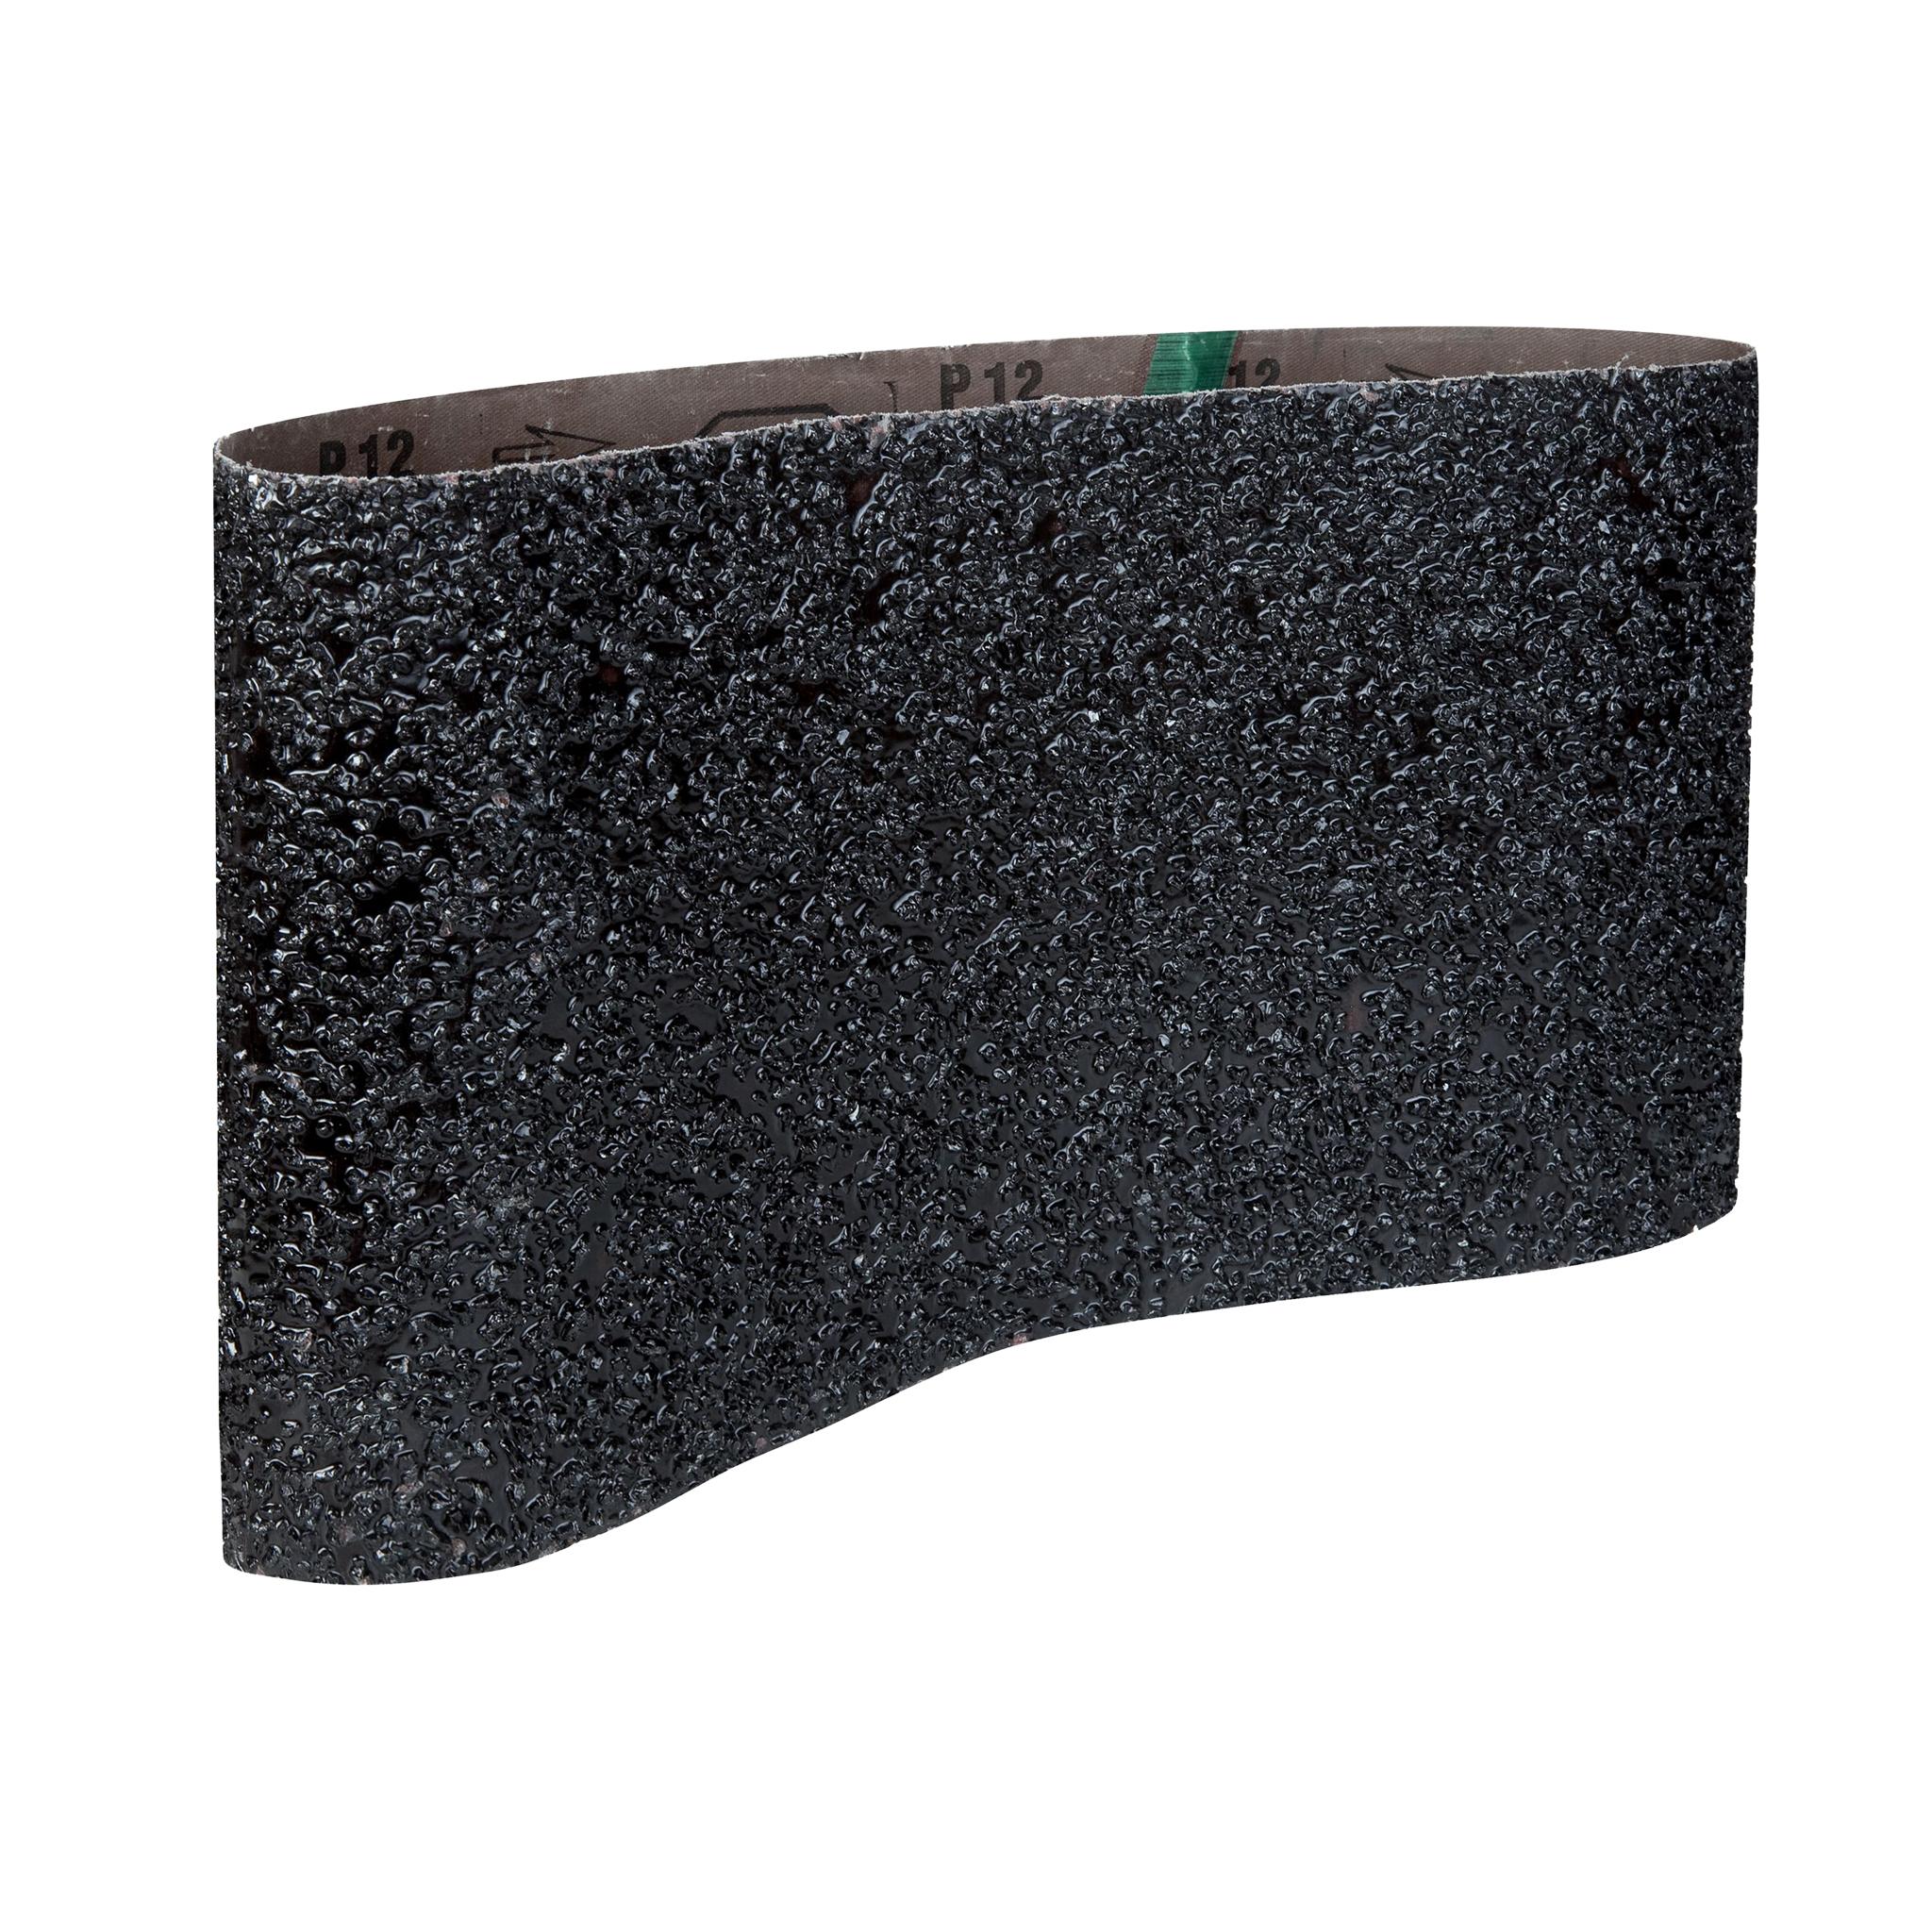 K 12 Parat Belts abrasive belt 200x551mm